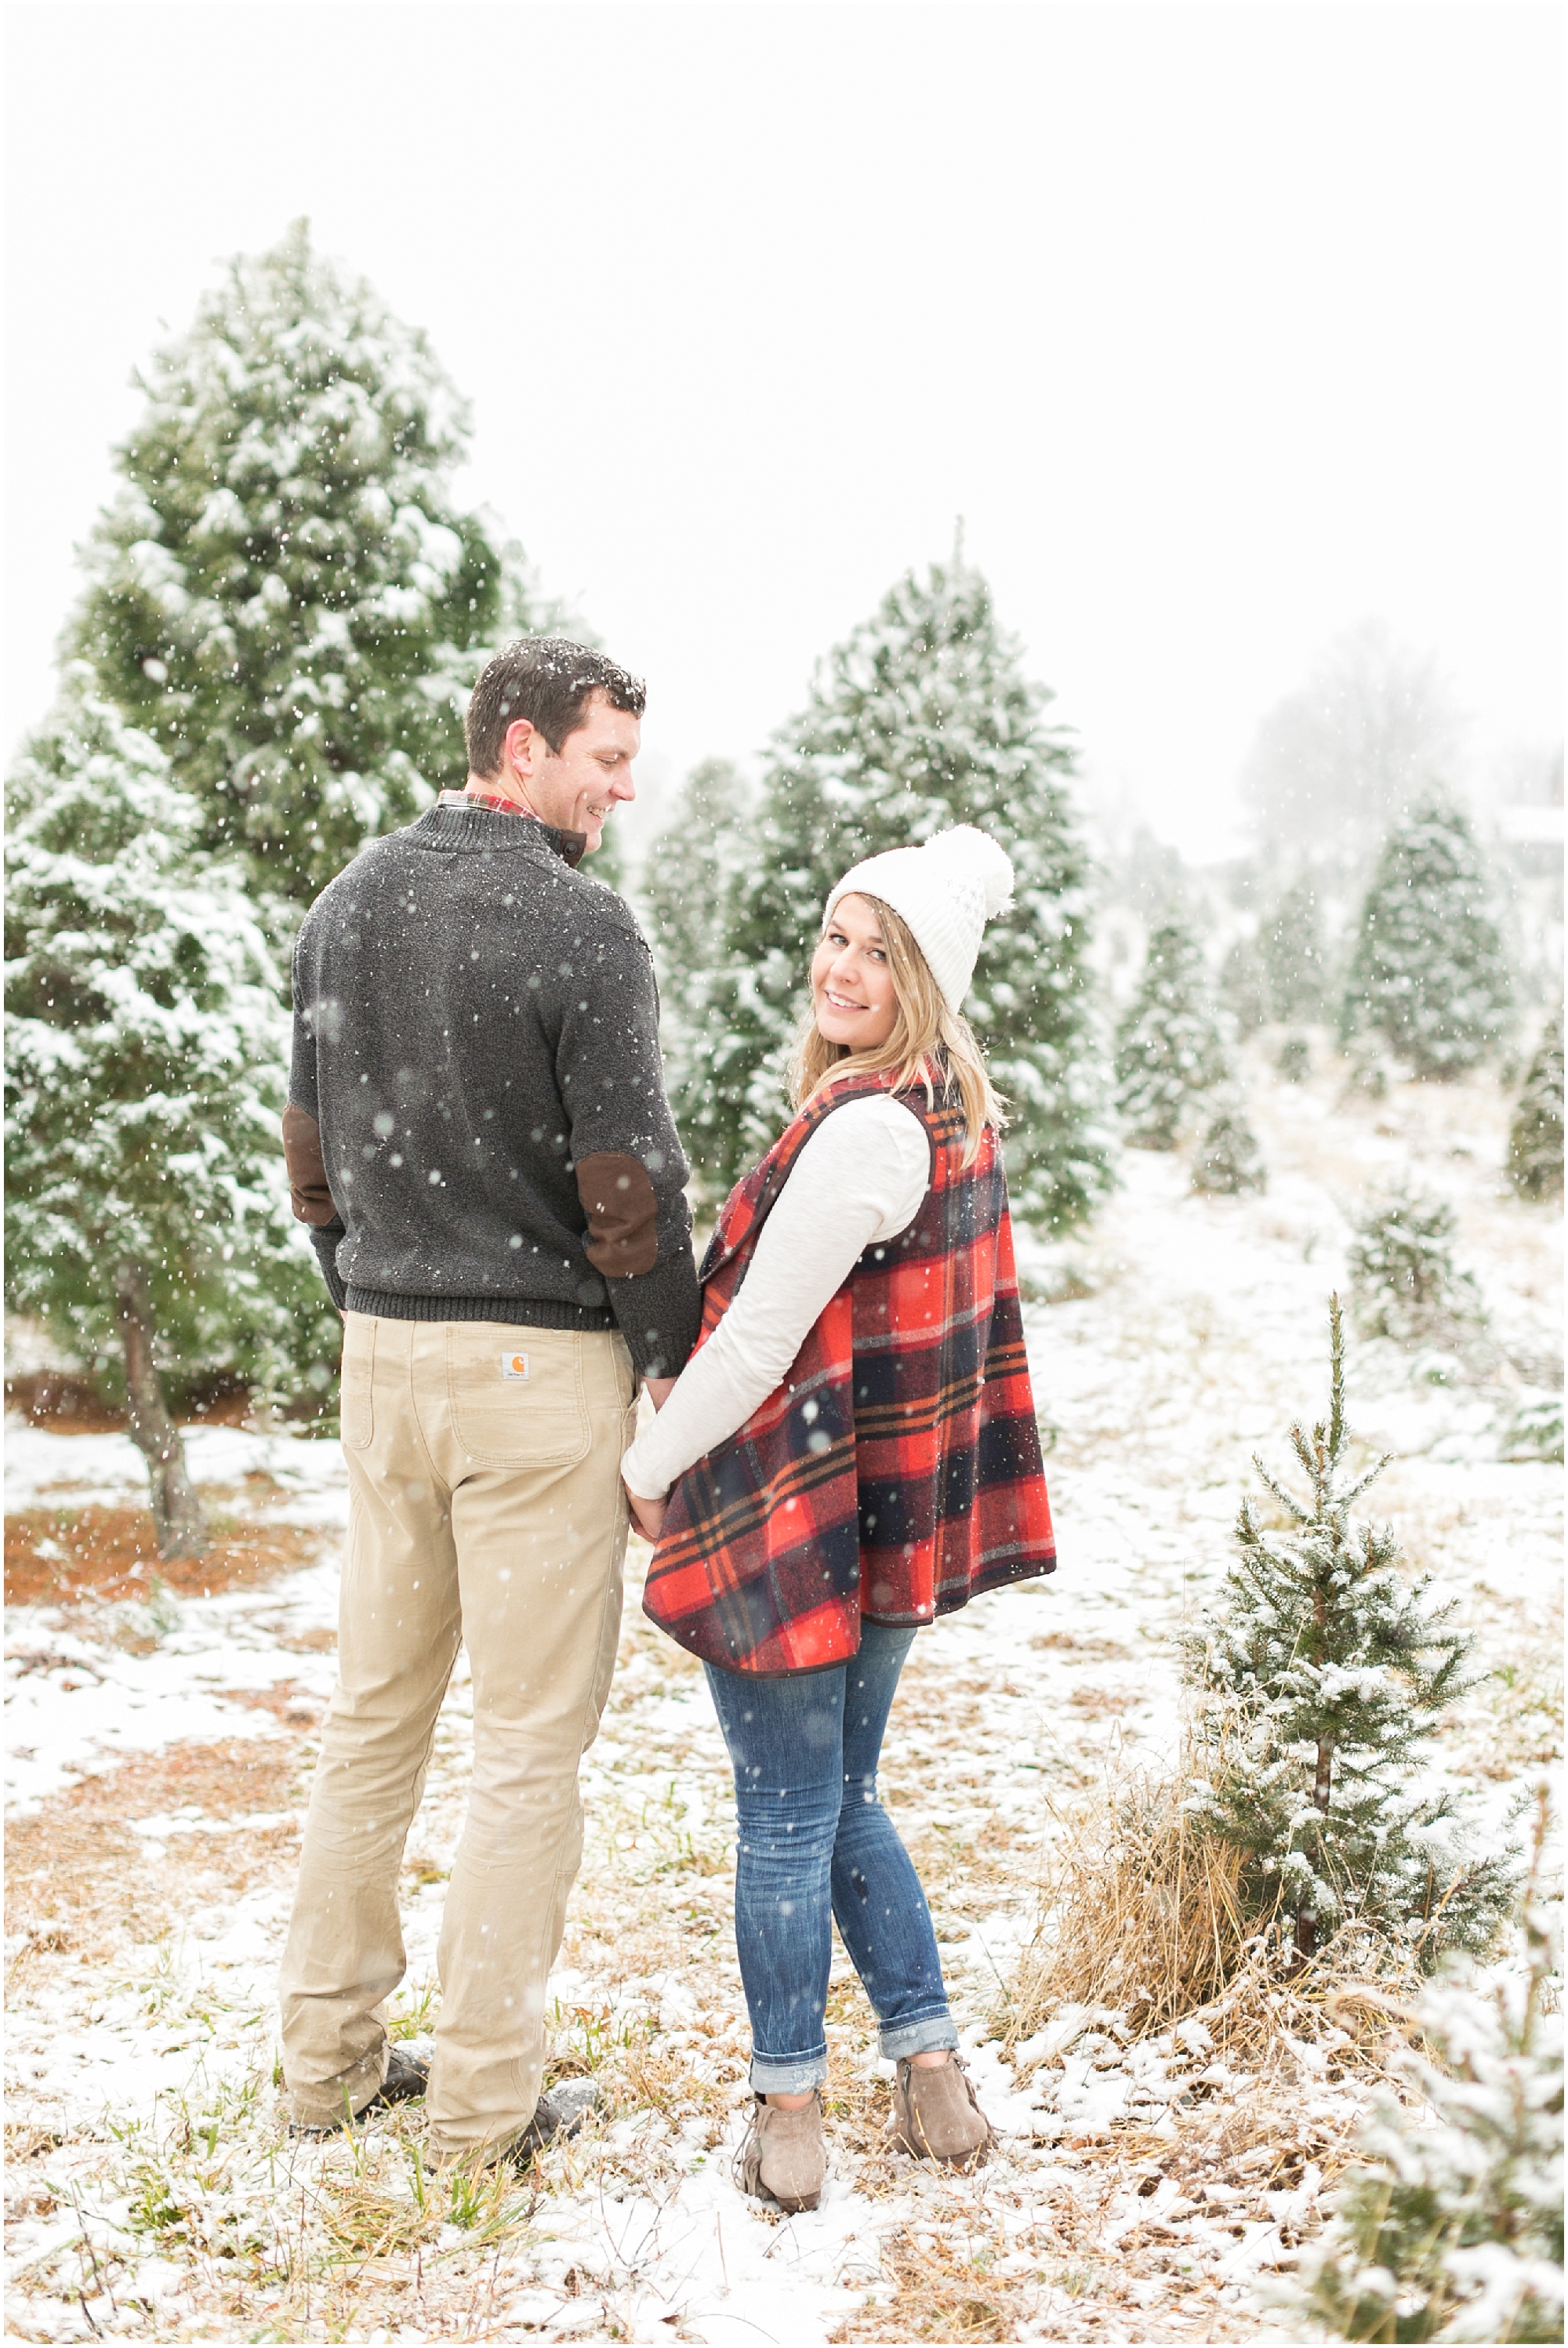 Belmont Christmas Tree Farm Engagement Portraits Jessica Ryan Photography